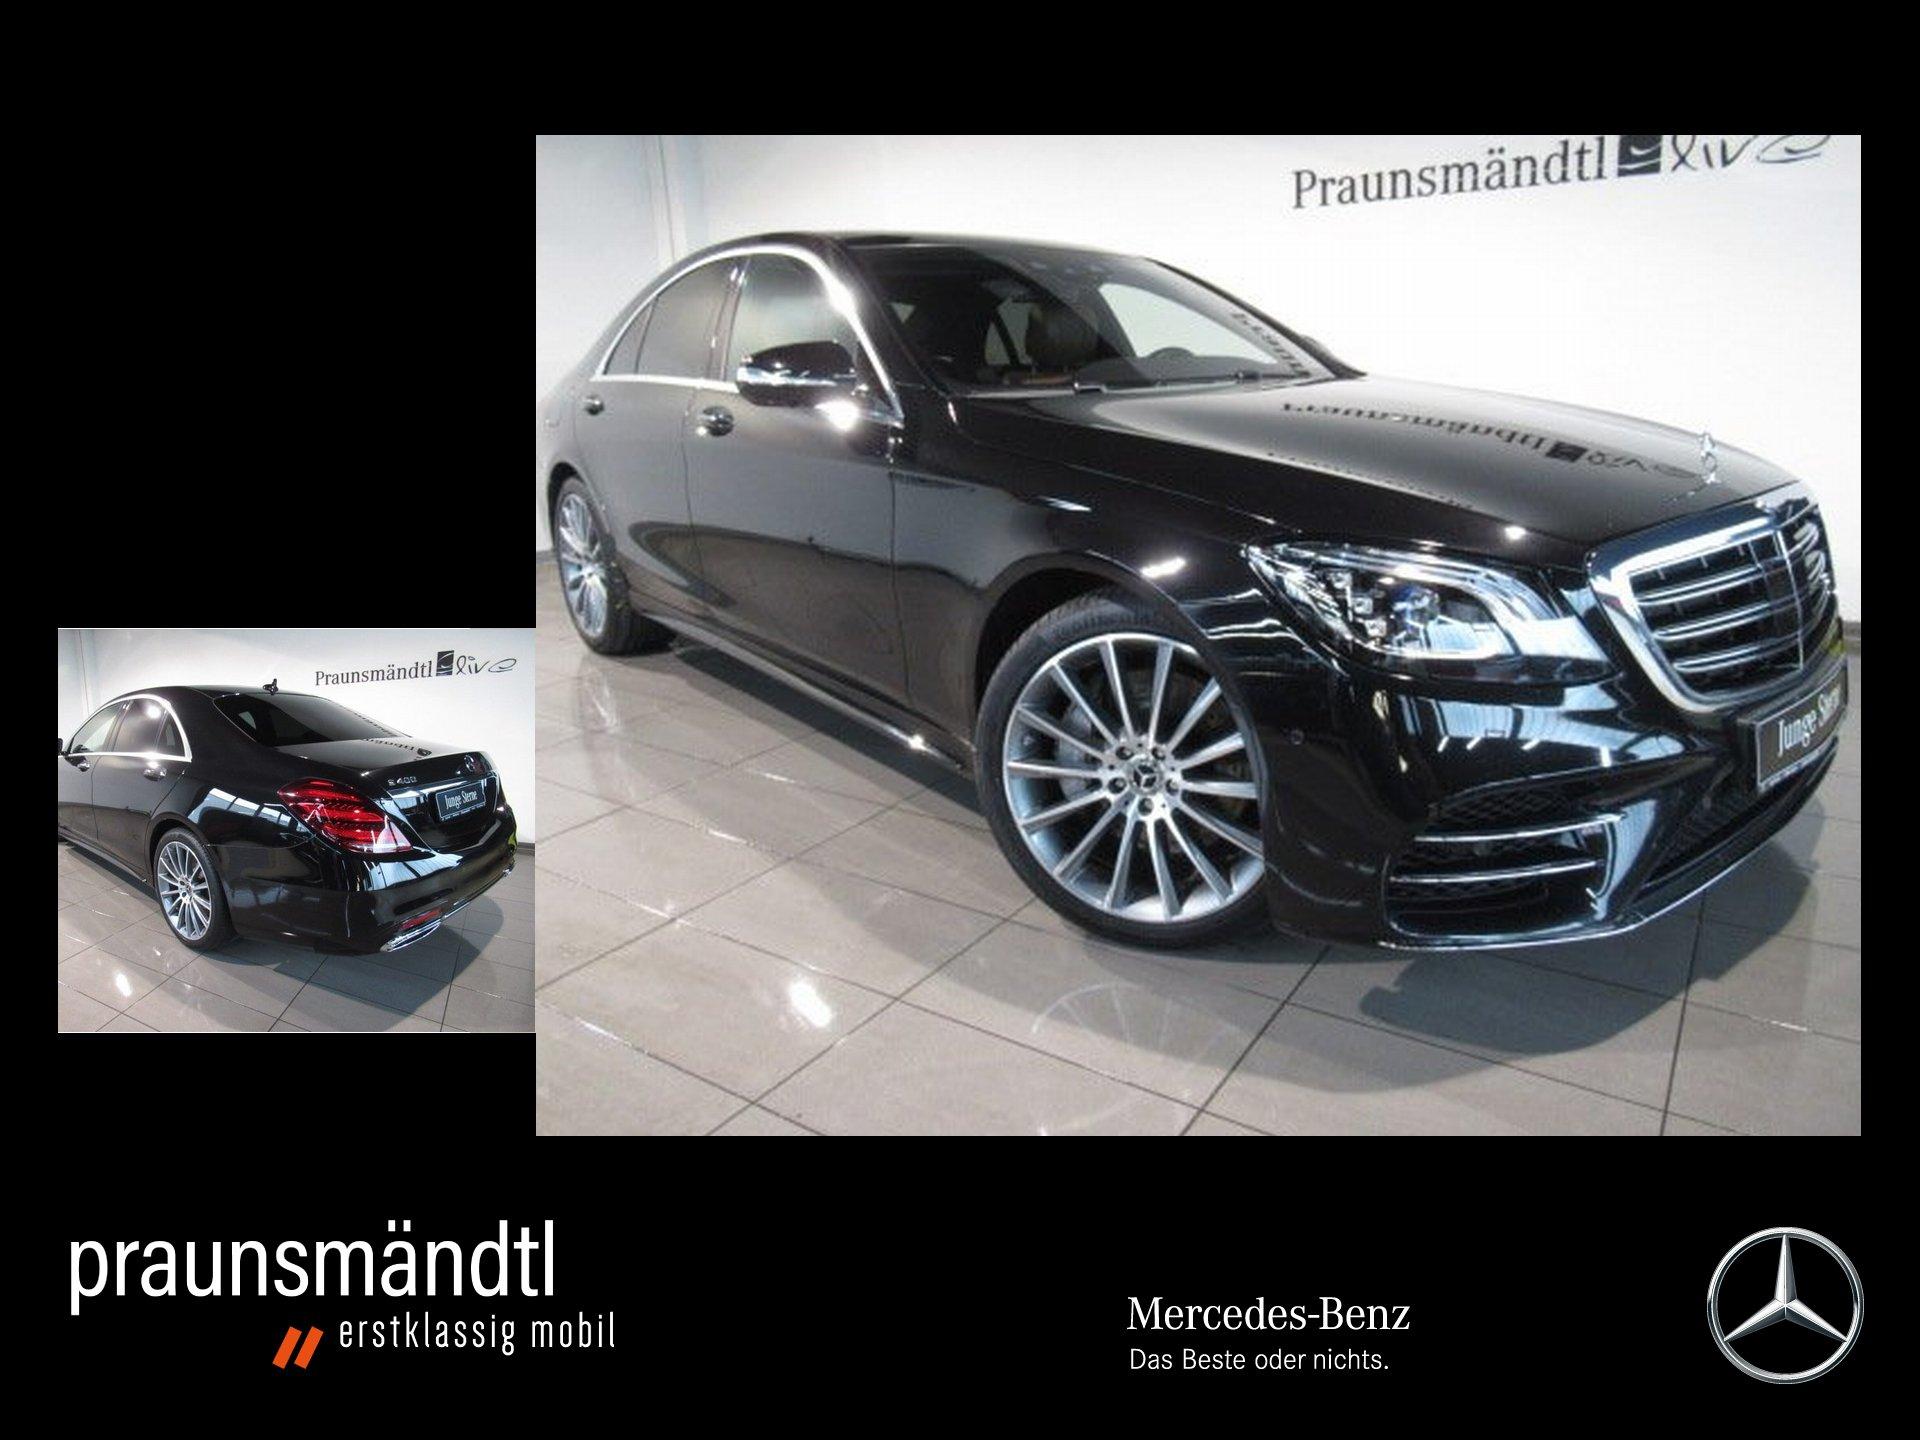 Mercedes-Benz S 400 d 4M AMG Pano/LED/Distro/Standhzg/360°/20, Jahr 2017, Diesel